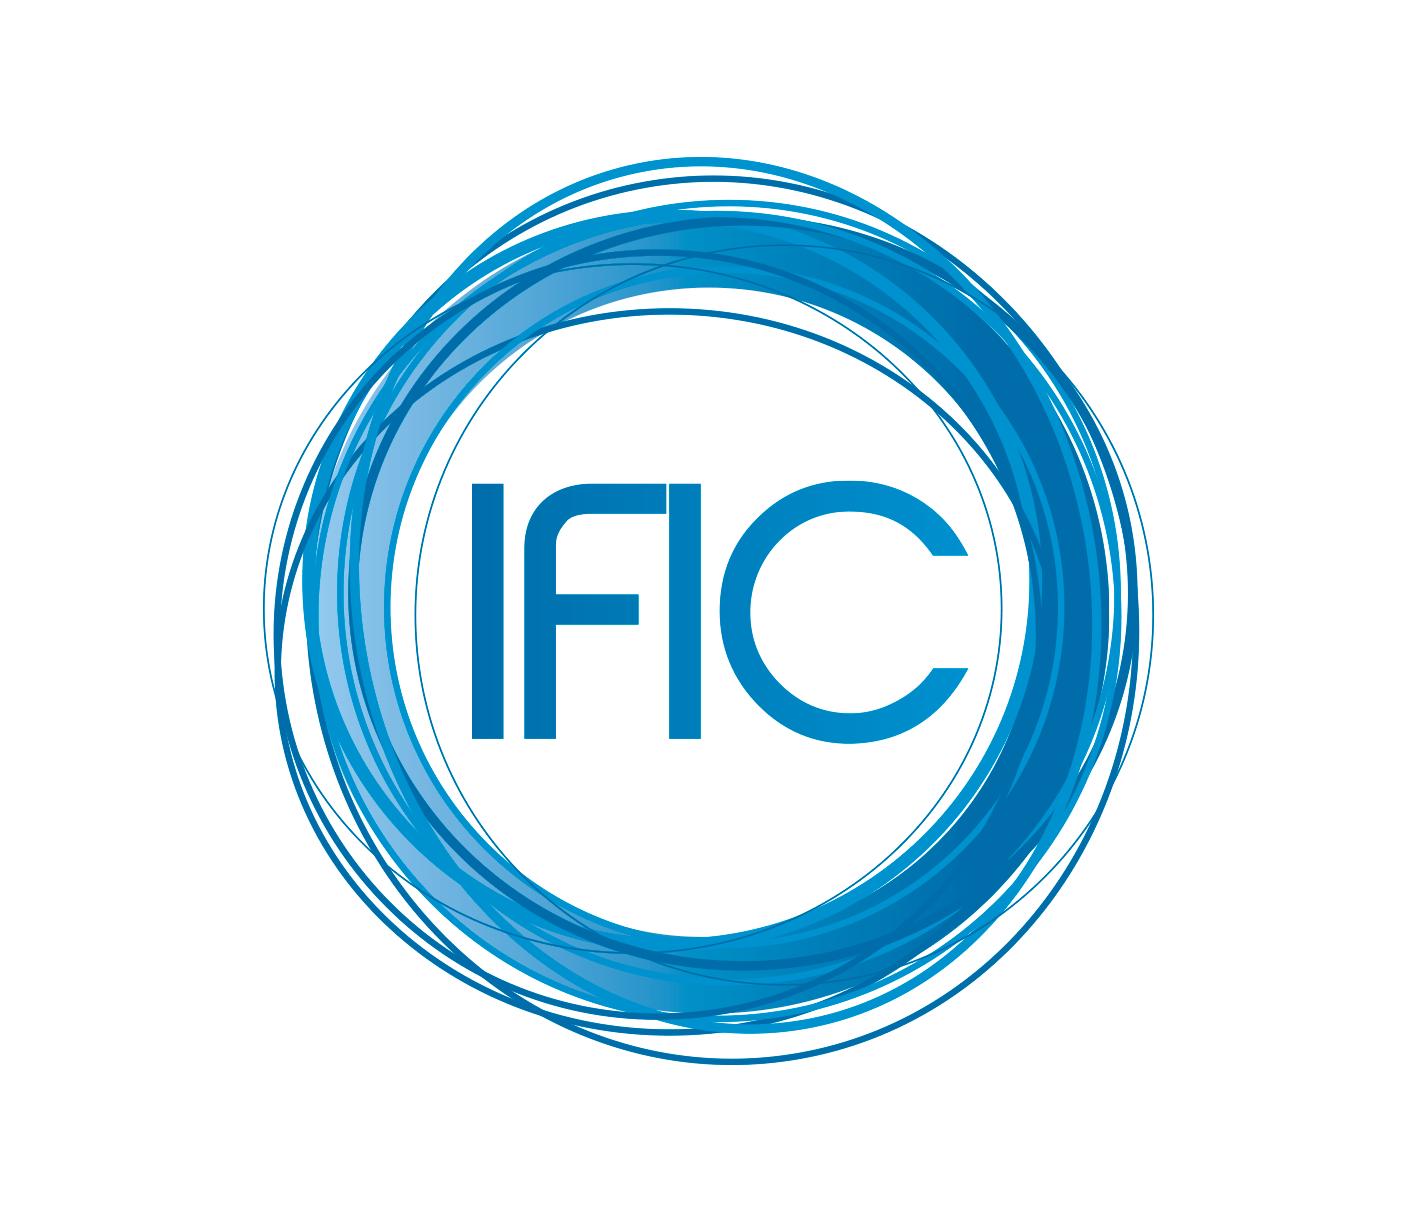 IFIC-logo-v2